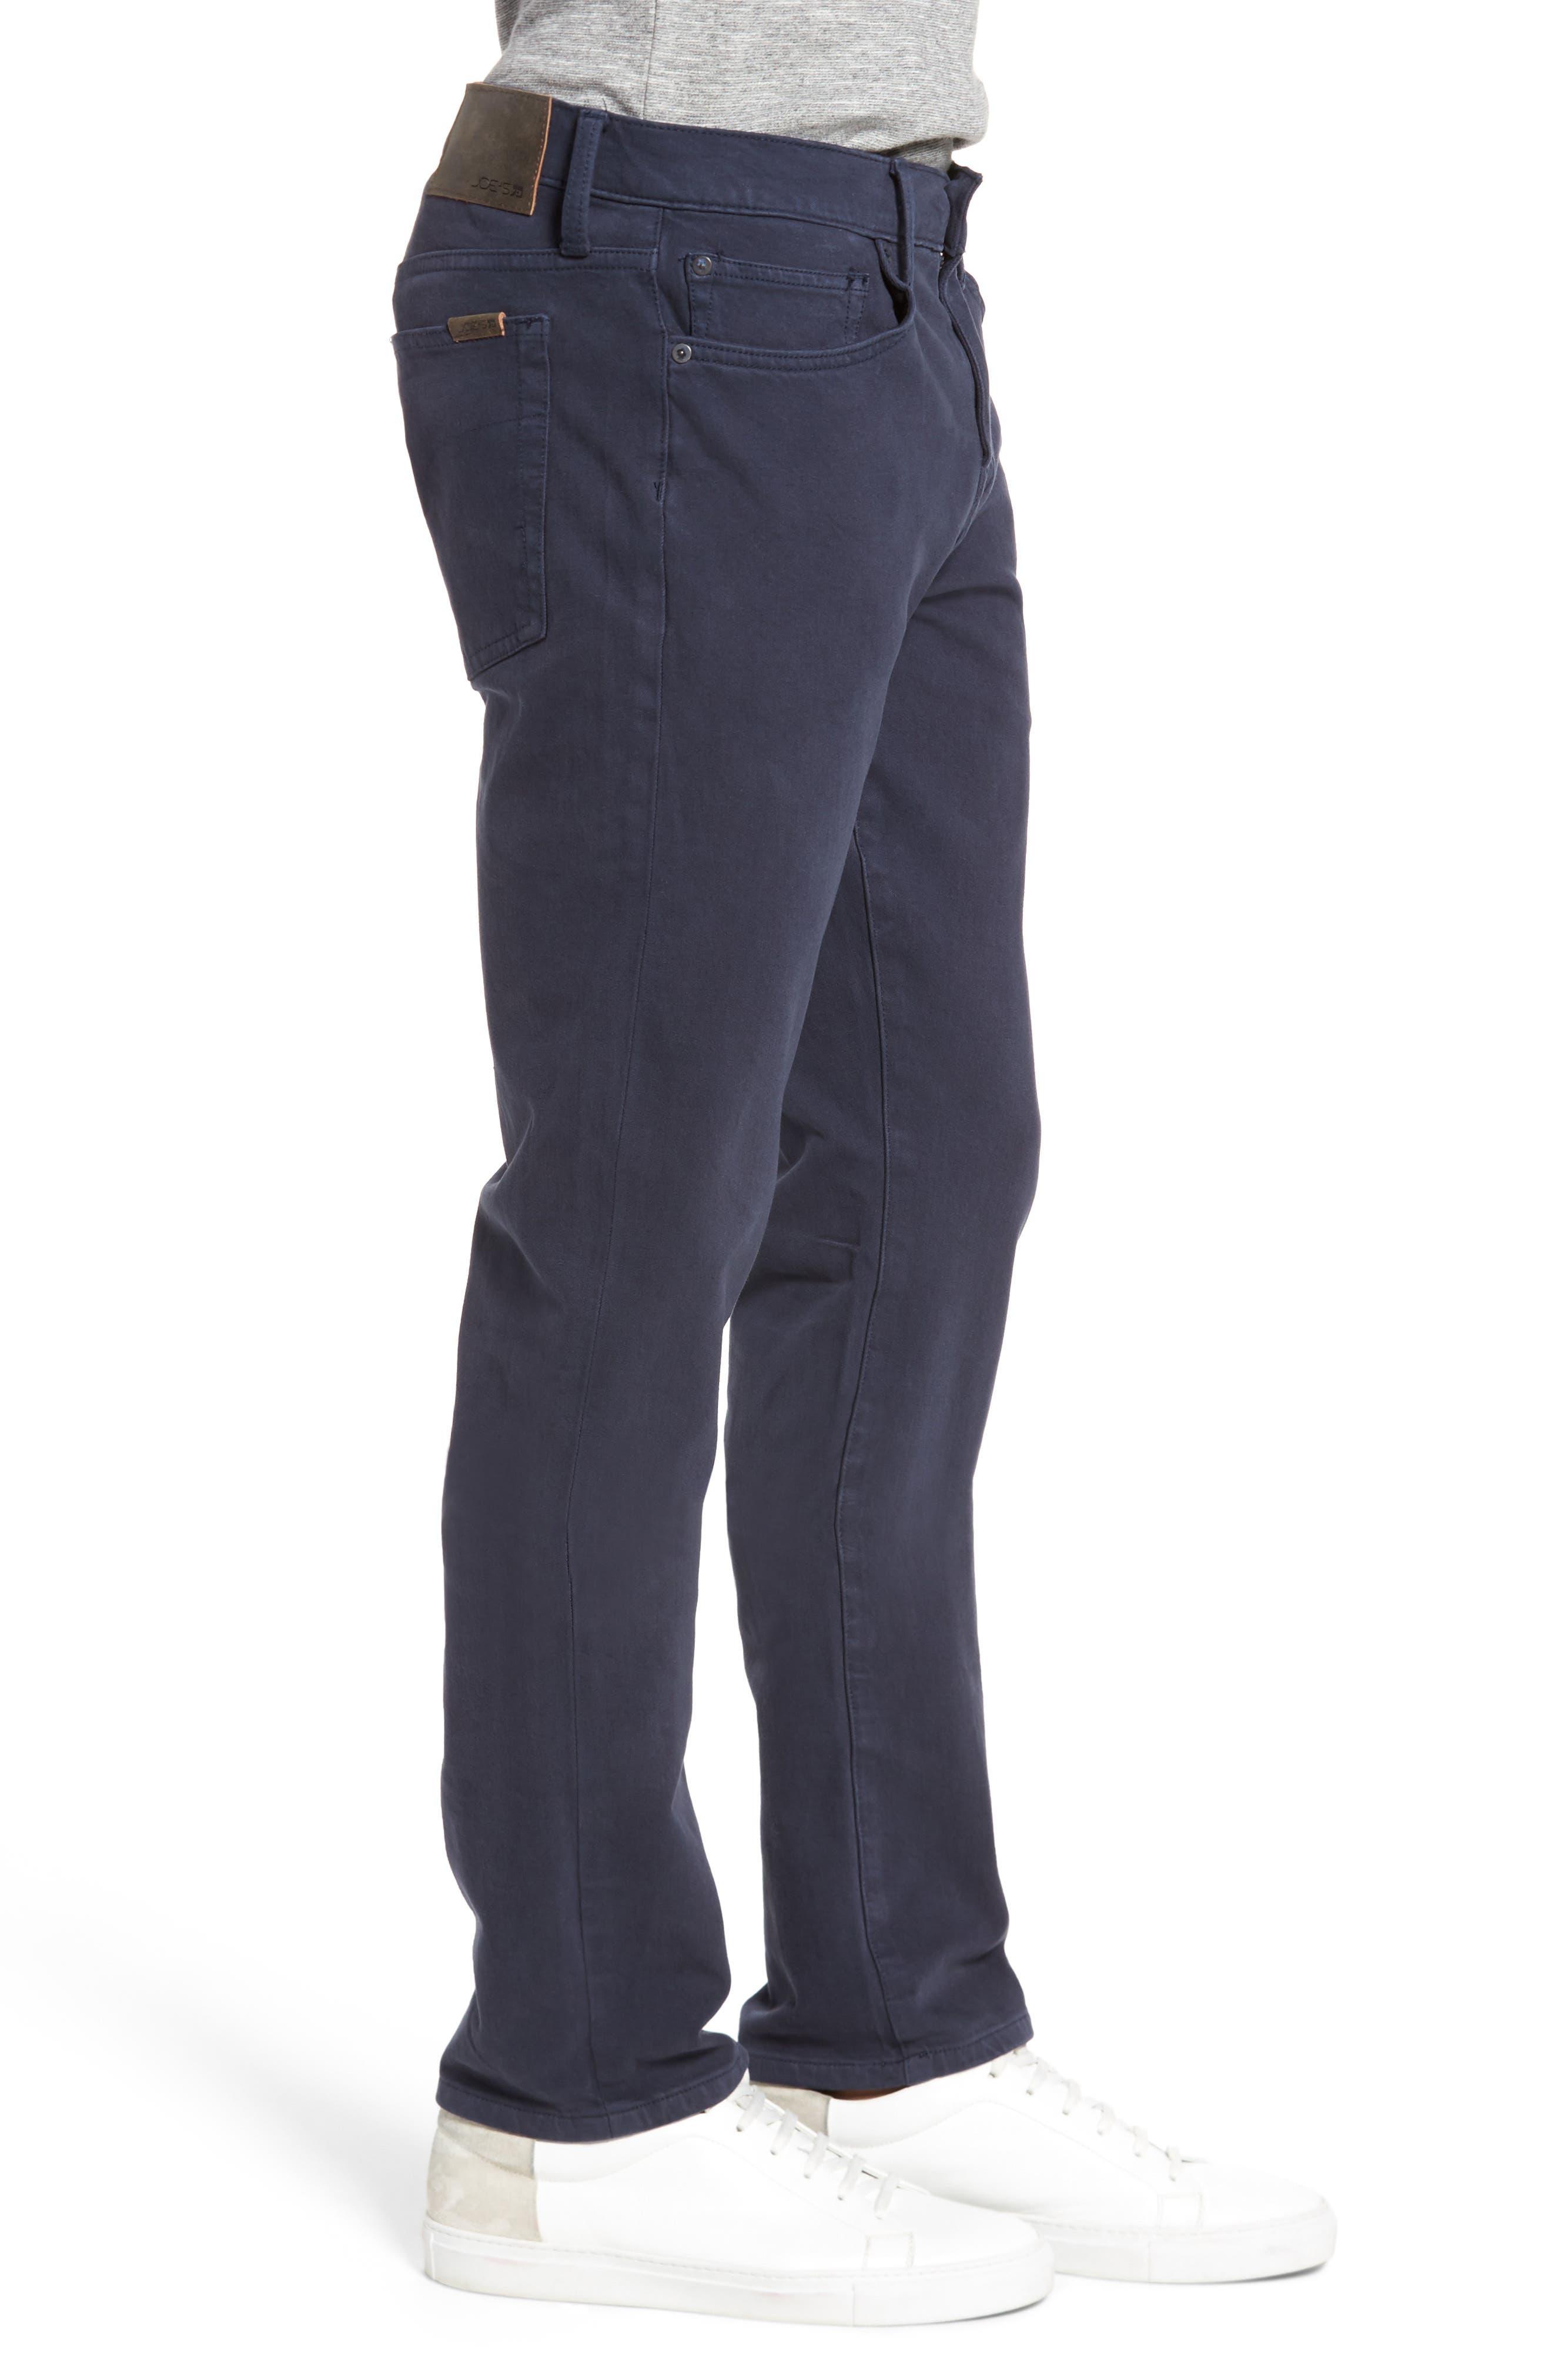 Kinetic Slim Fit Twill Pants,                             Alternate thumbnail 3, color,                             NAVY